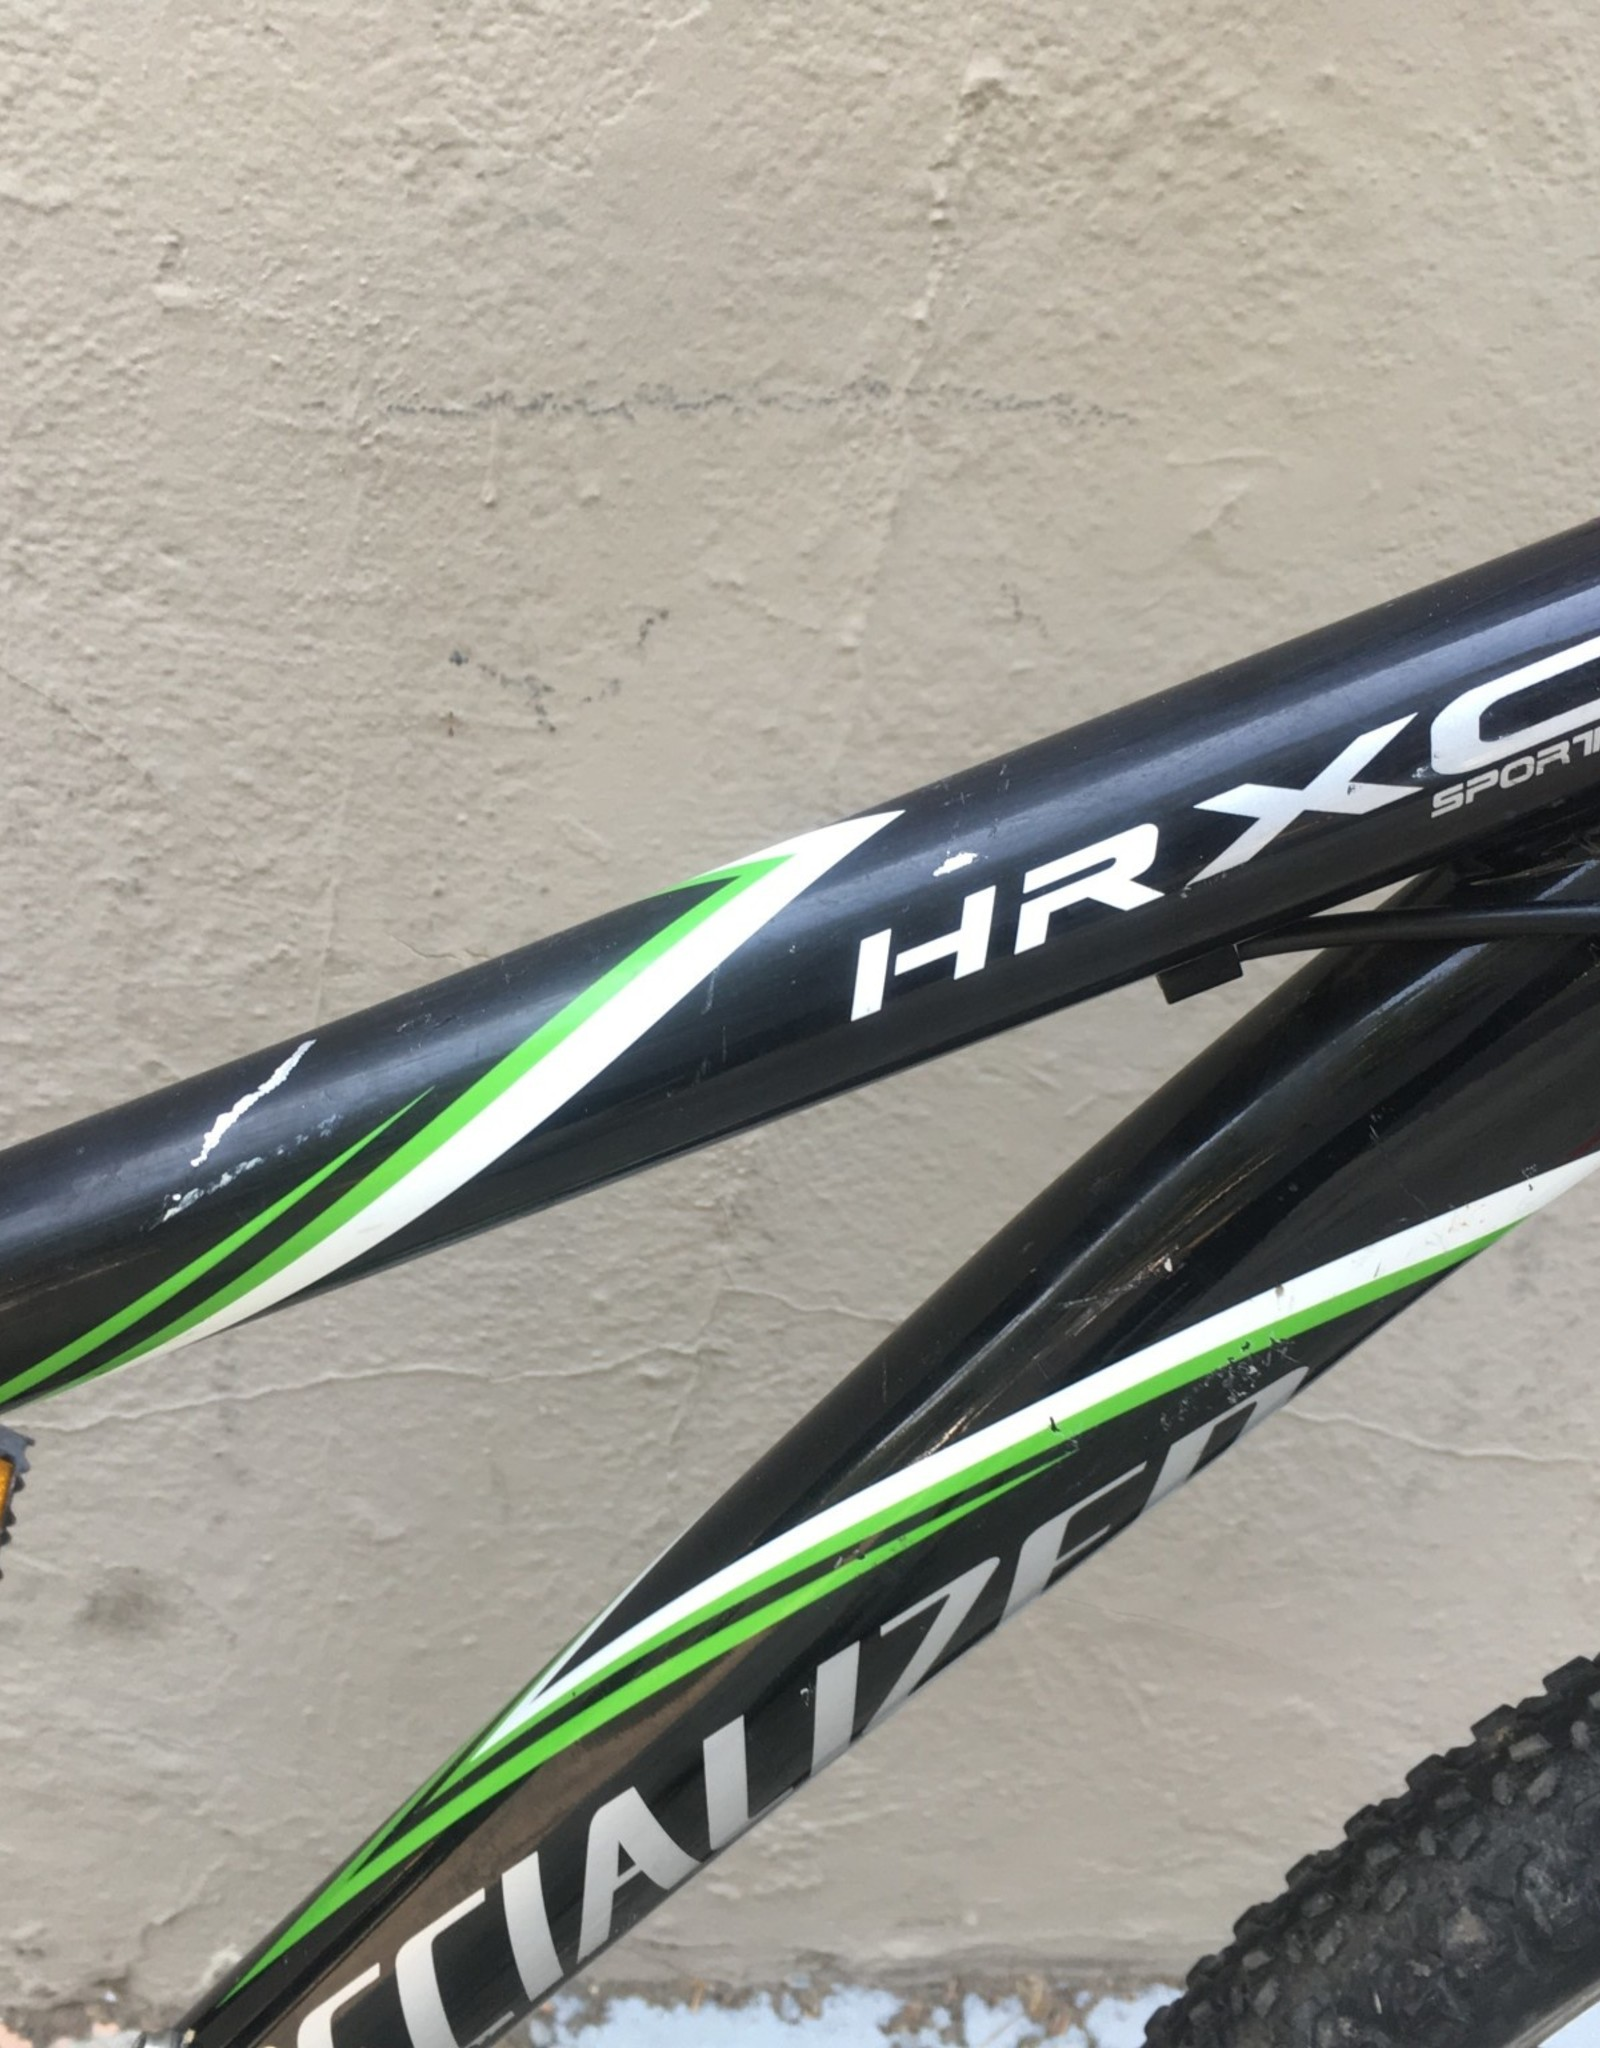 Specialized Specialized Hardrock HR XC Sport Mountain, 15 Inches, Black w/ Green, 2008